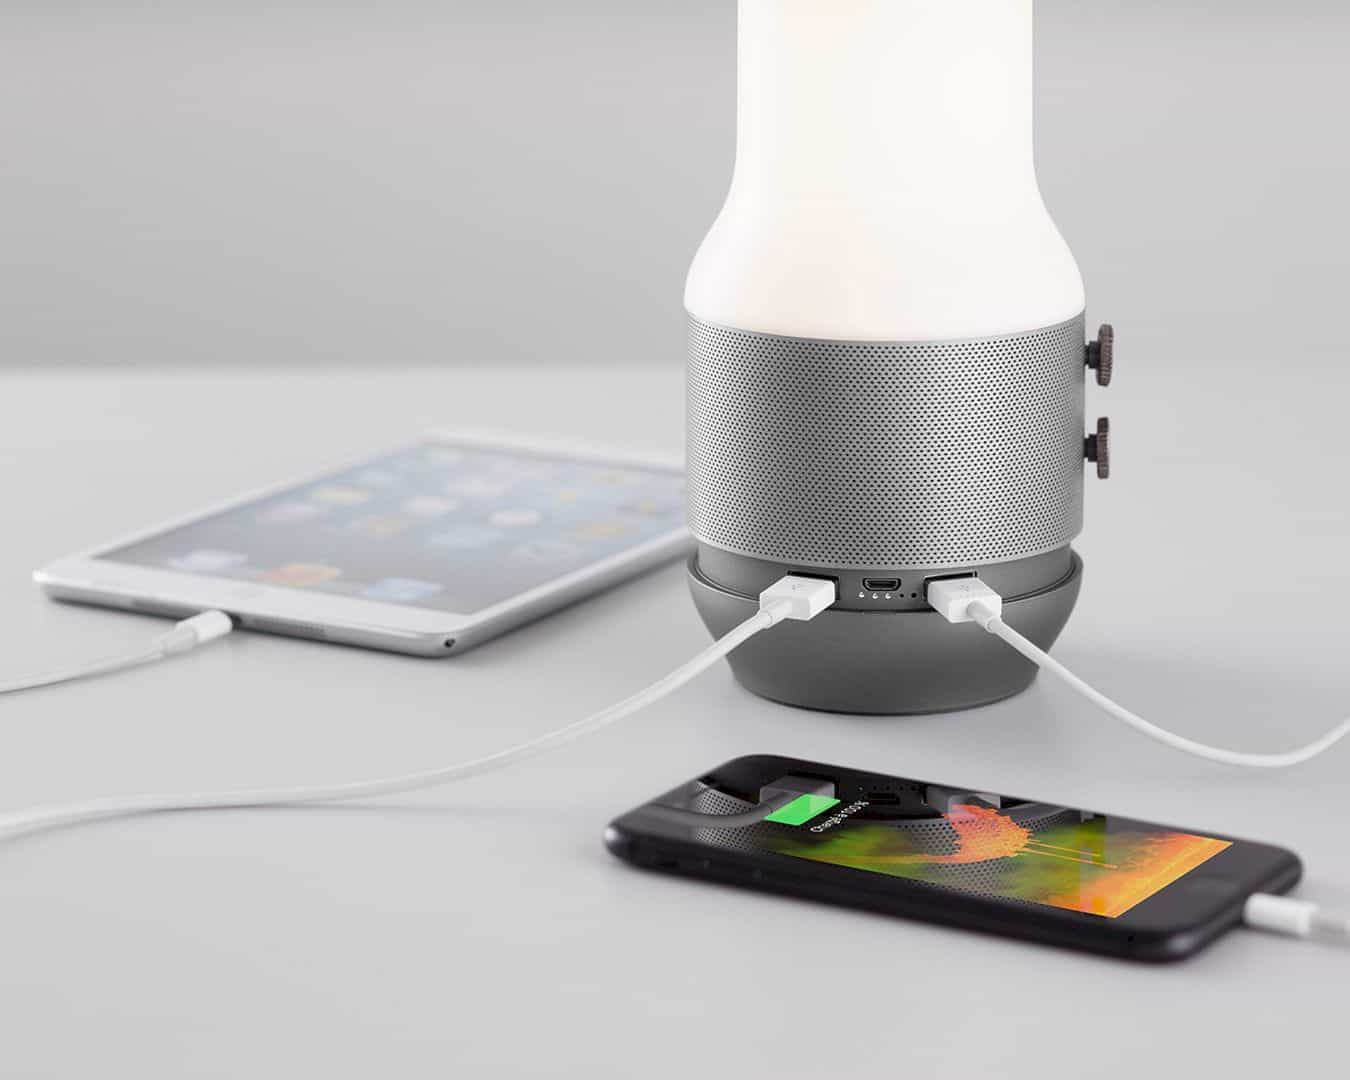 LEXON Terrace 3-in-1 Bluetooth Speaker: one stylishly attractive gadget